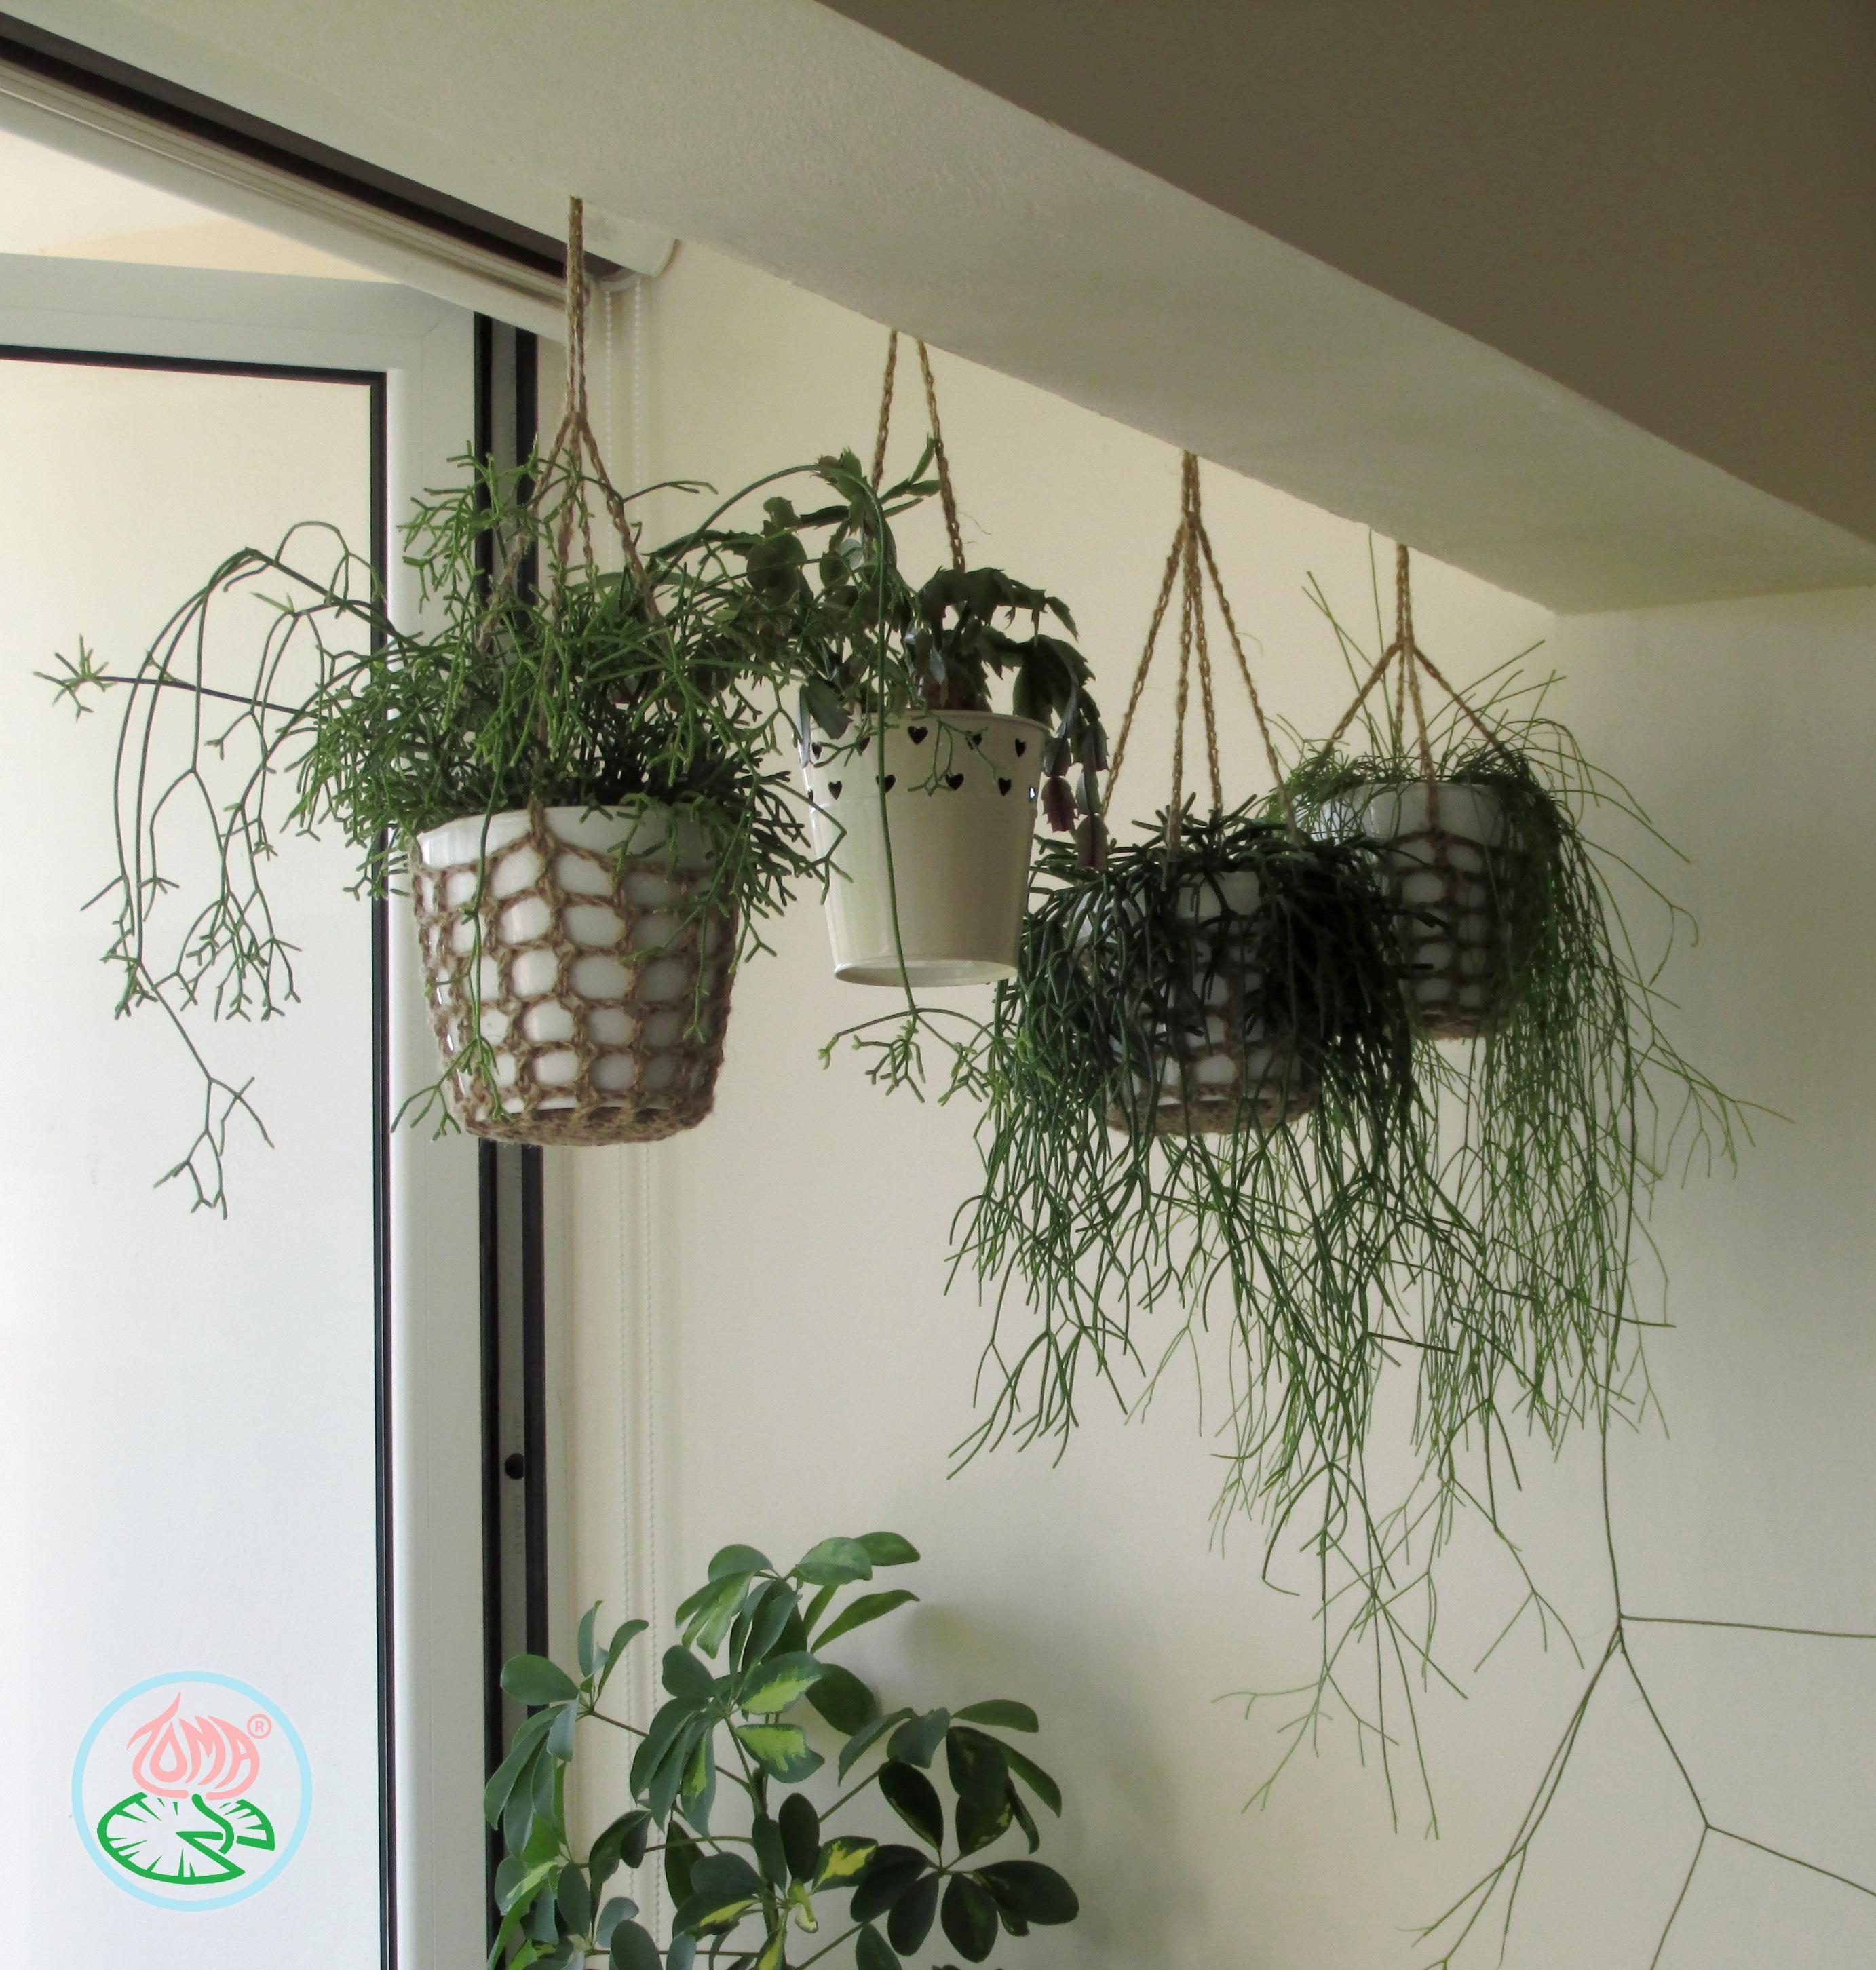 Free Pattern Crochet Hanging Plant Pot Holder Hanging Plants